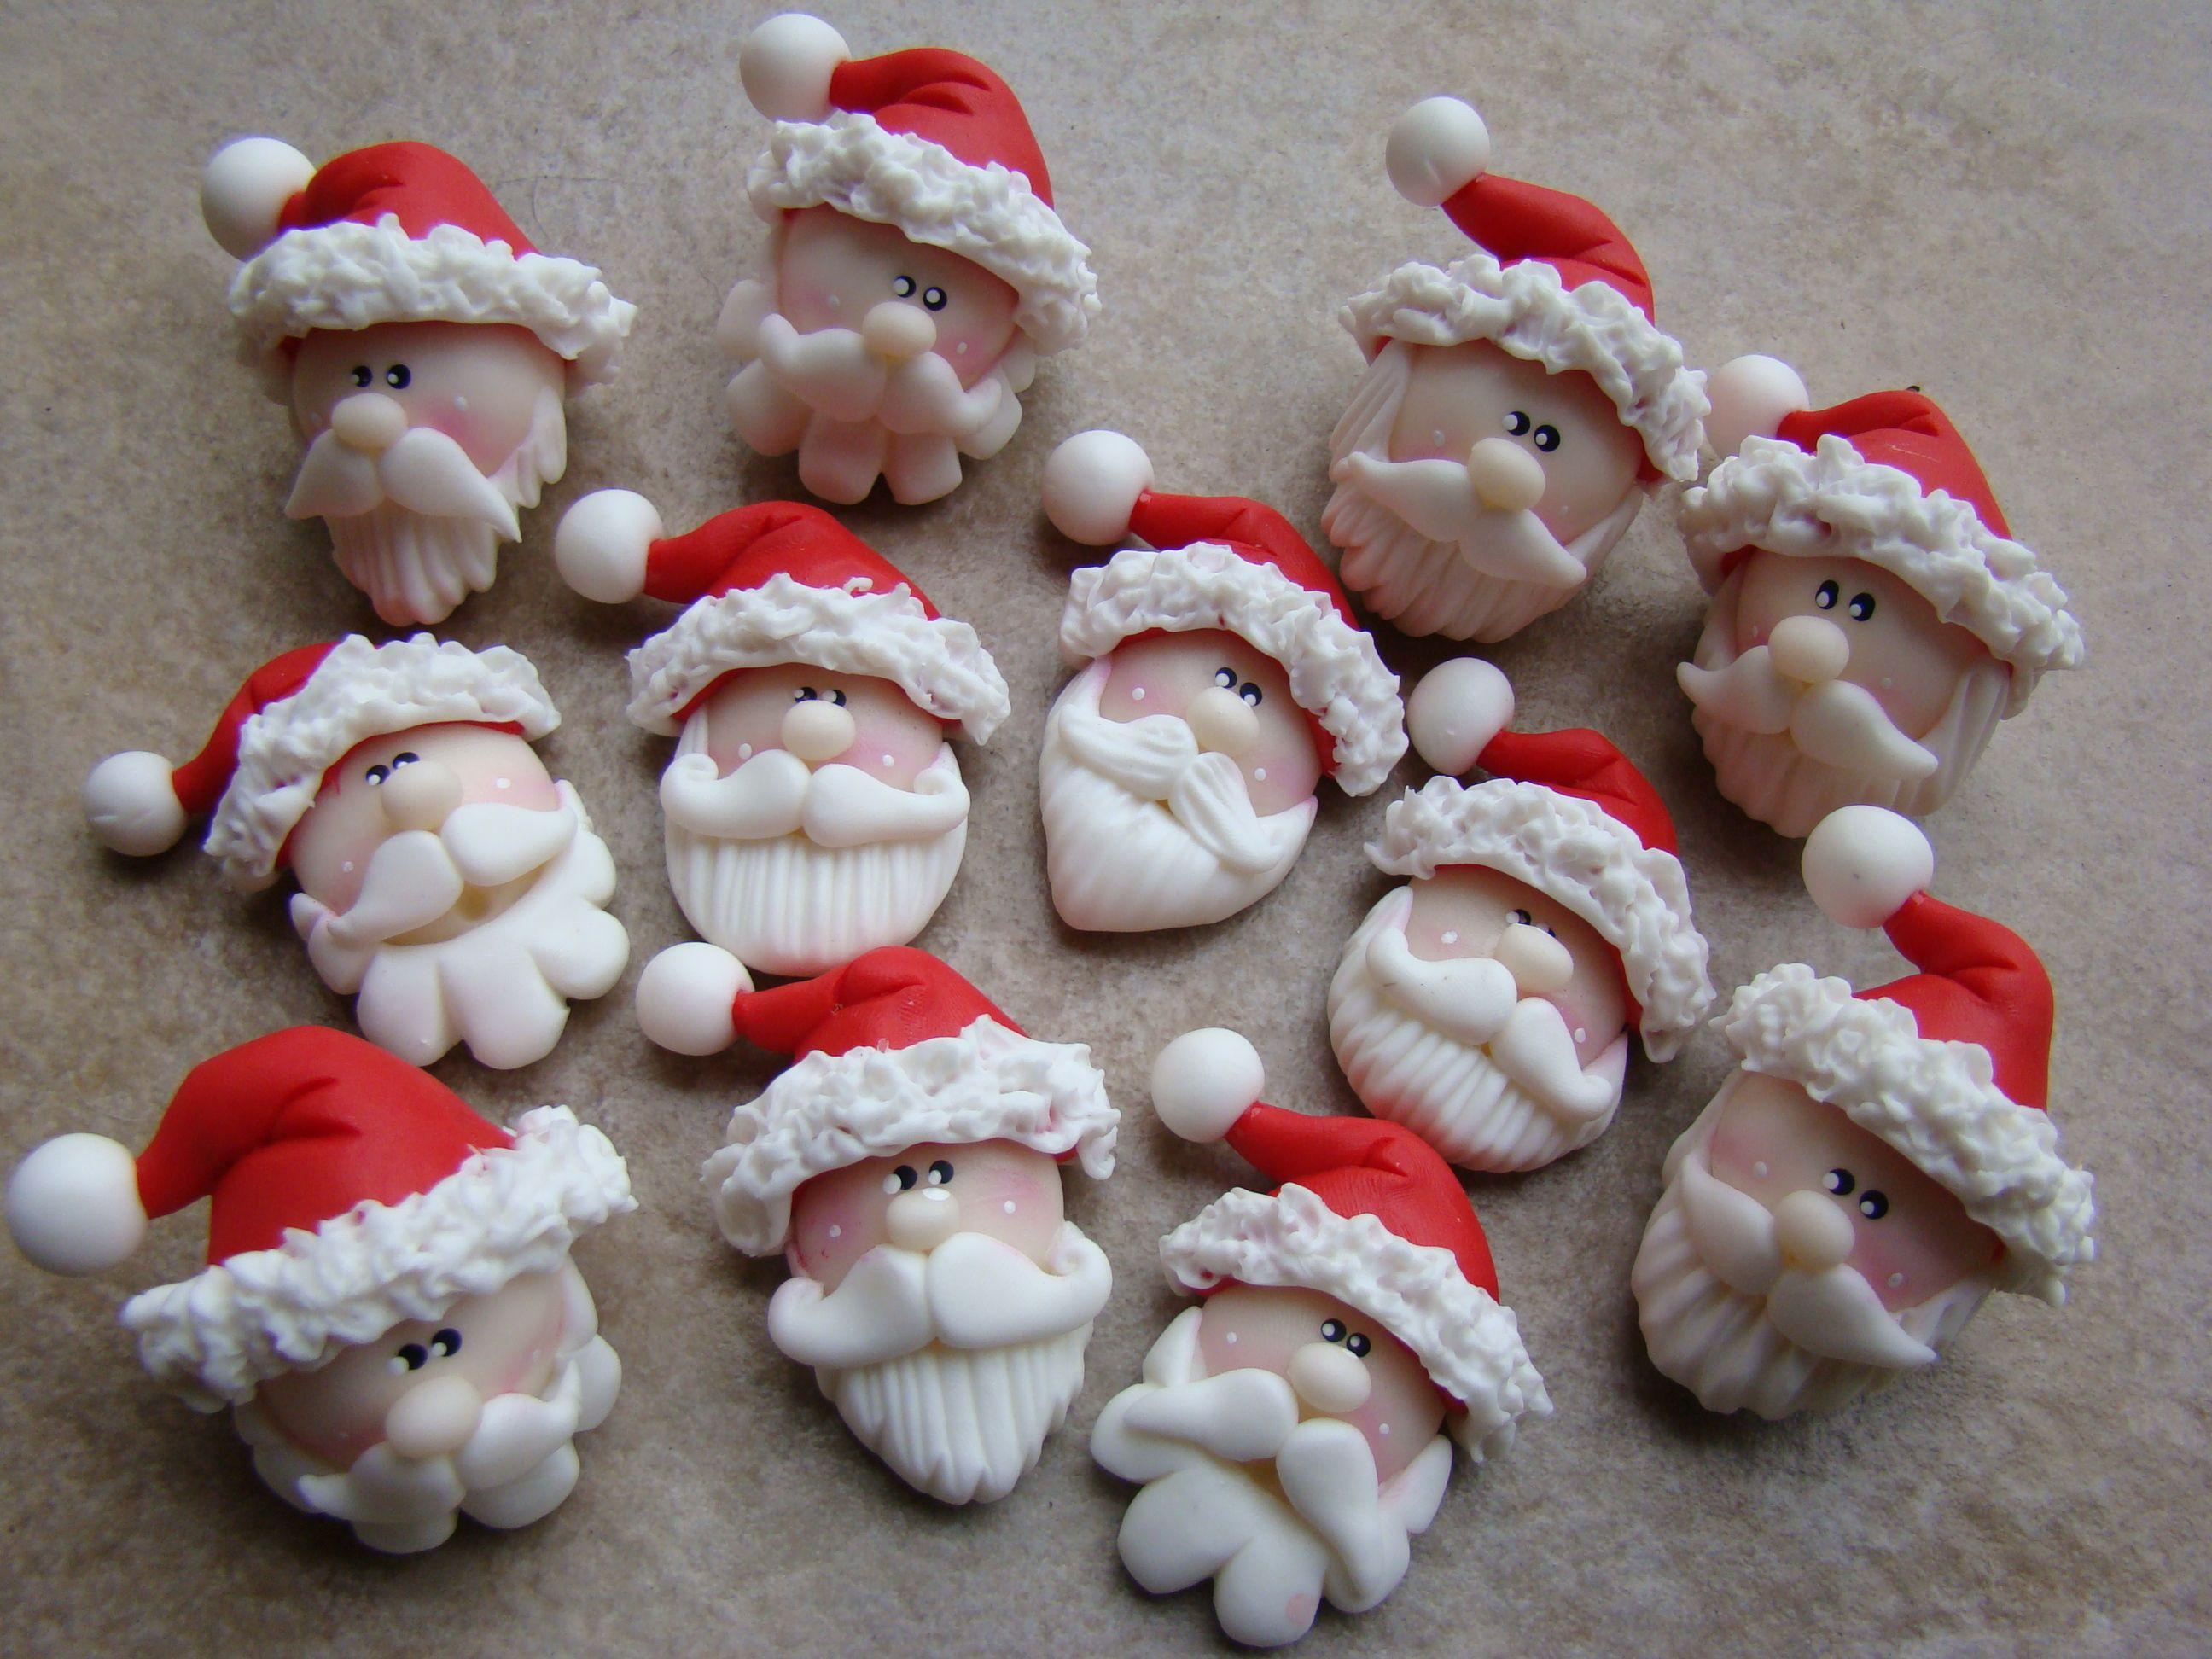 Caritas papa noel navidad en porcelana fria pinterest for Adornos navidenos en porcelana fria utilisima